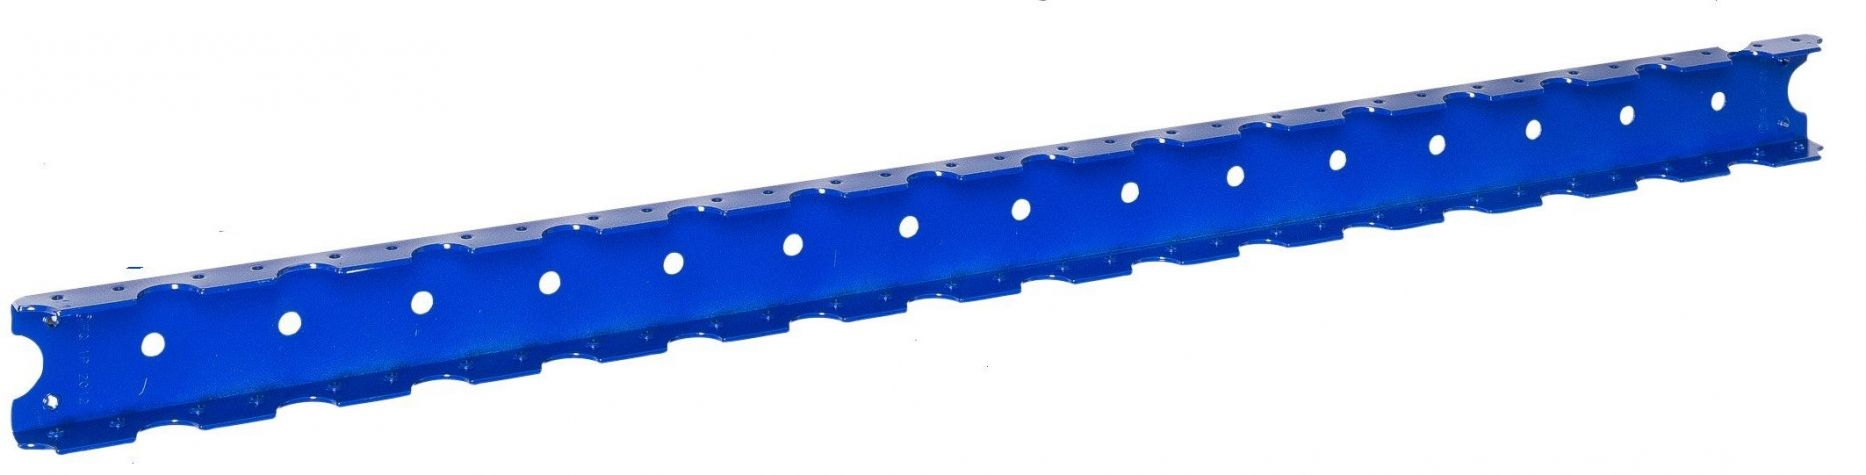 FlexBeam™ 1120 mm